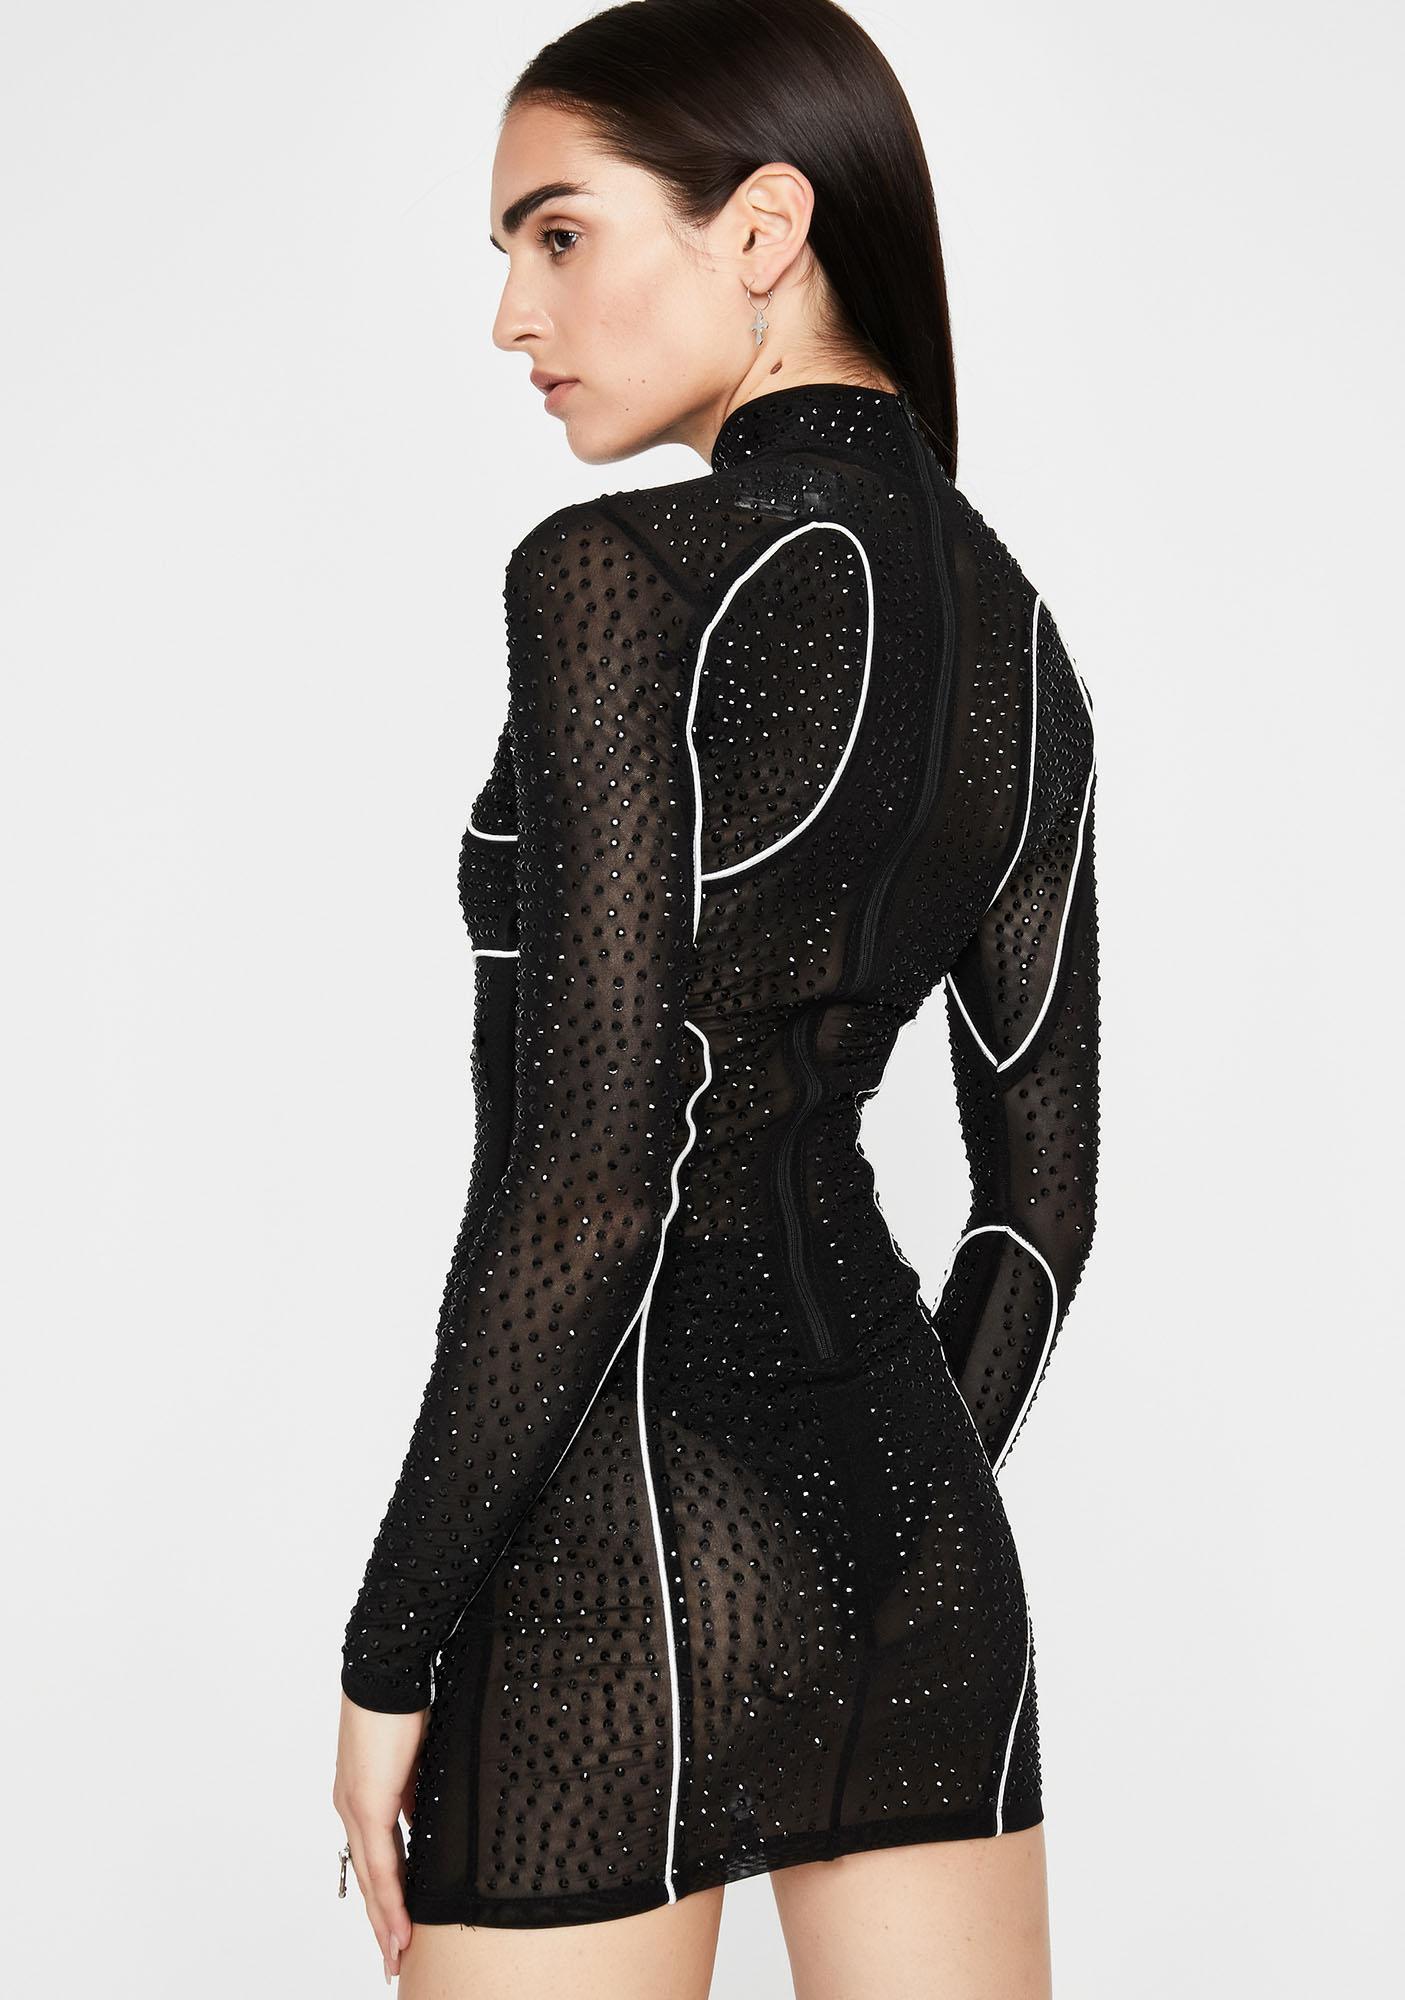 In My Element Bodycon Dress